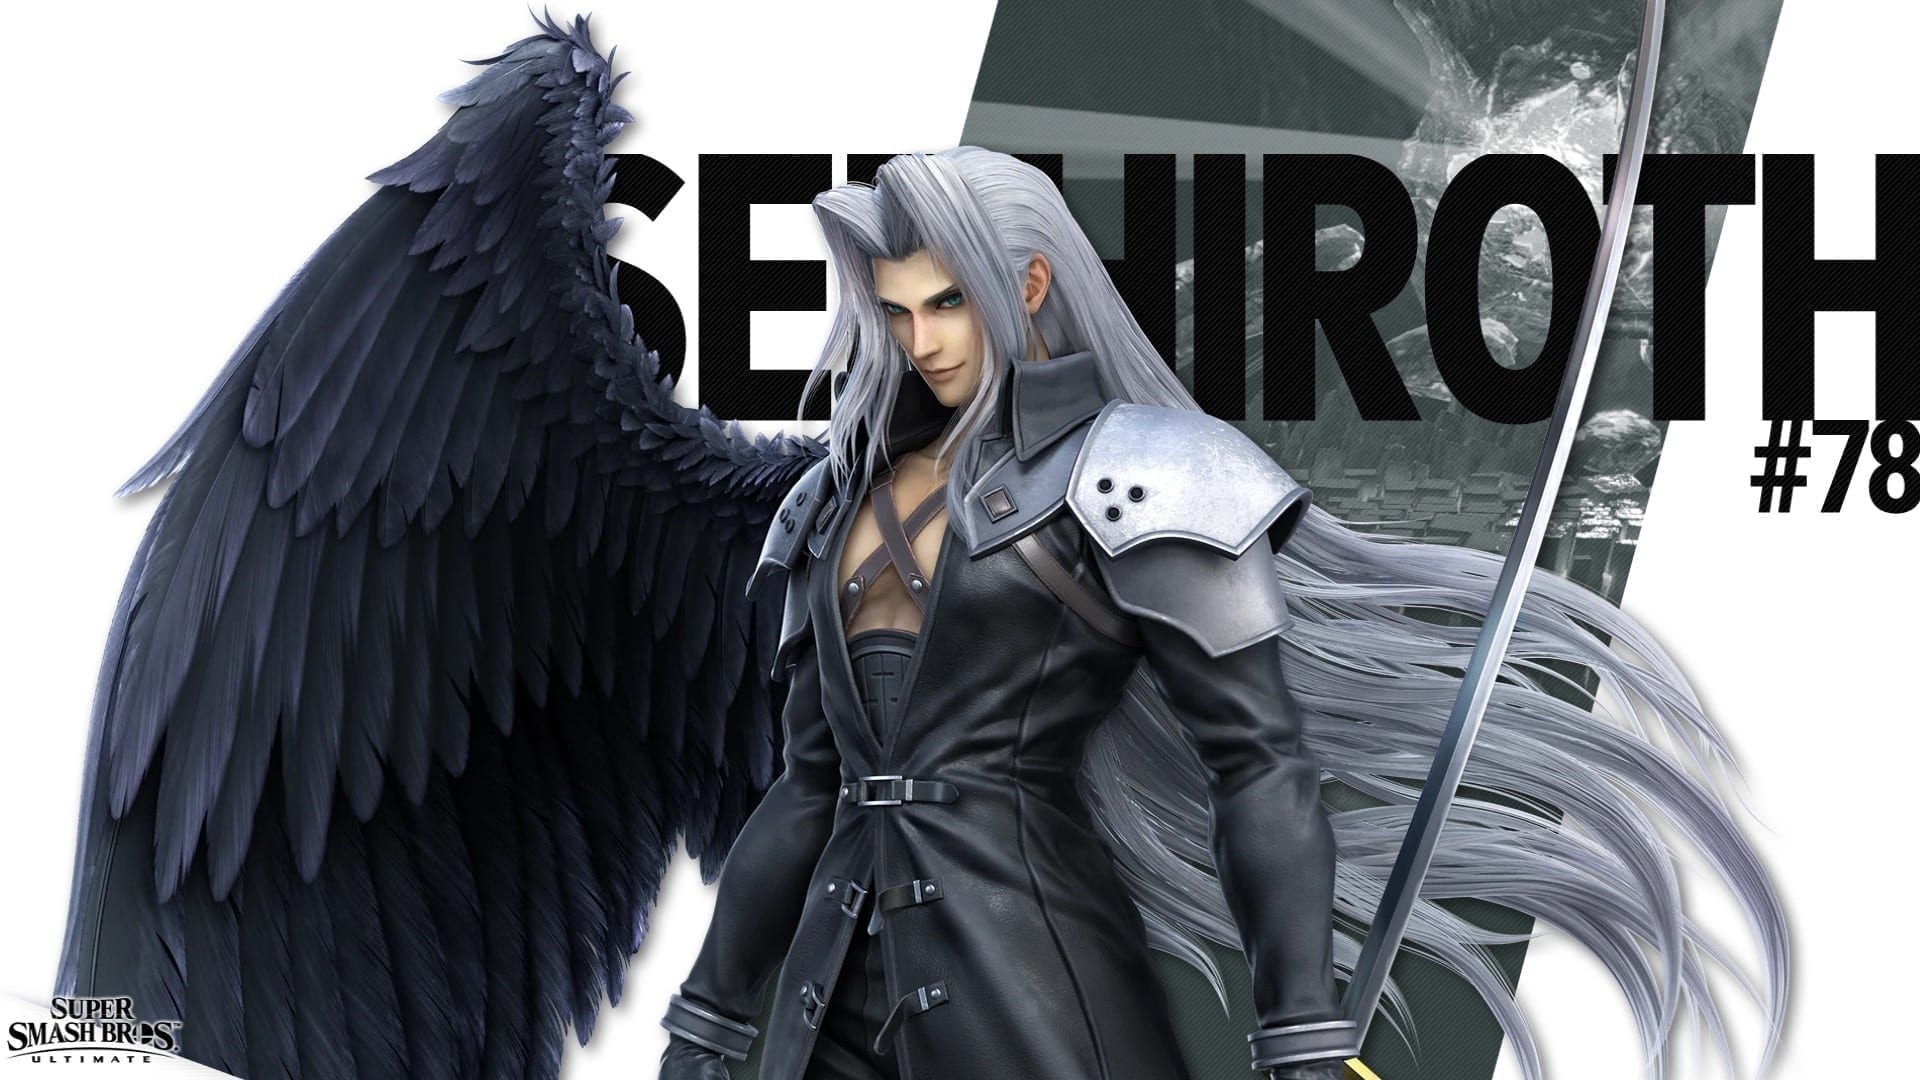 sephiroth neuer kämpfer in Super Smash Bros Ultimate